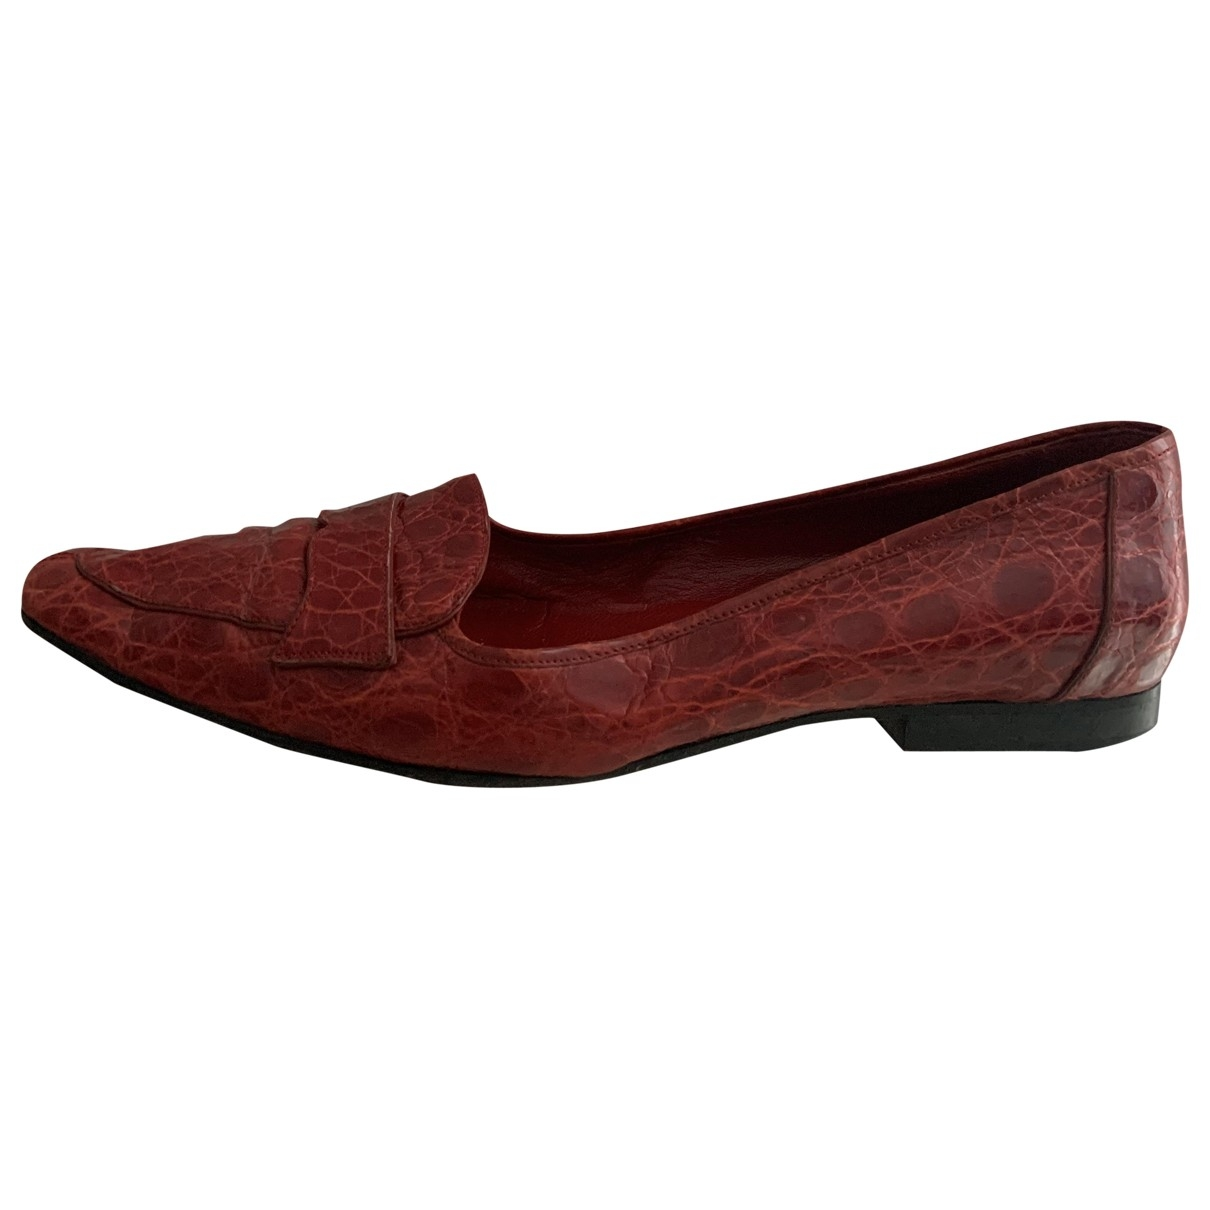 Andrea Pfister \N Red Crocodile Flats for Women 38 EU